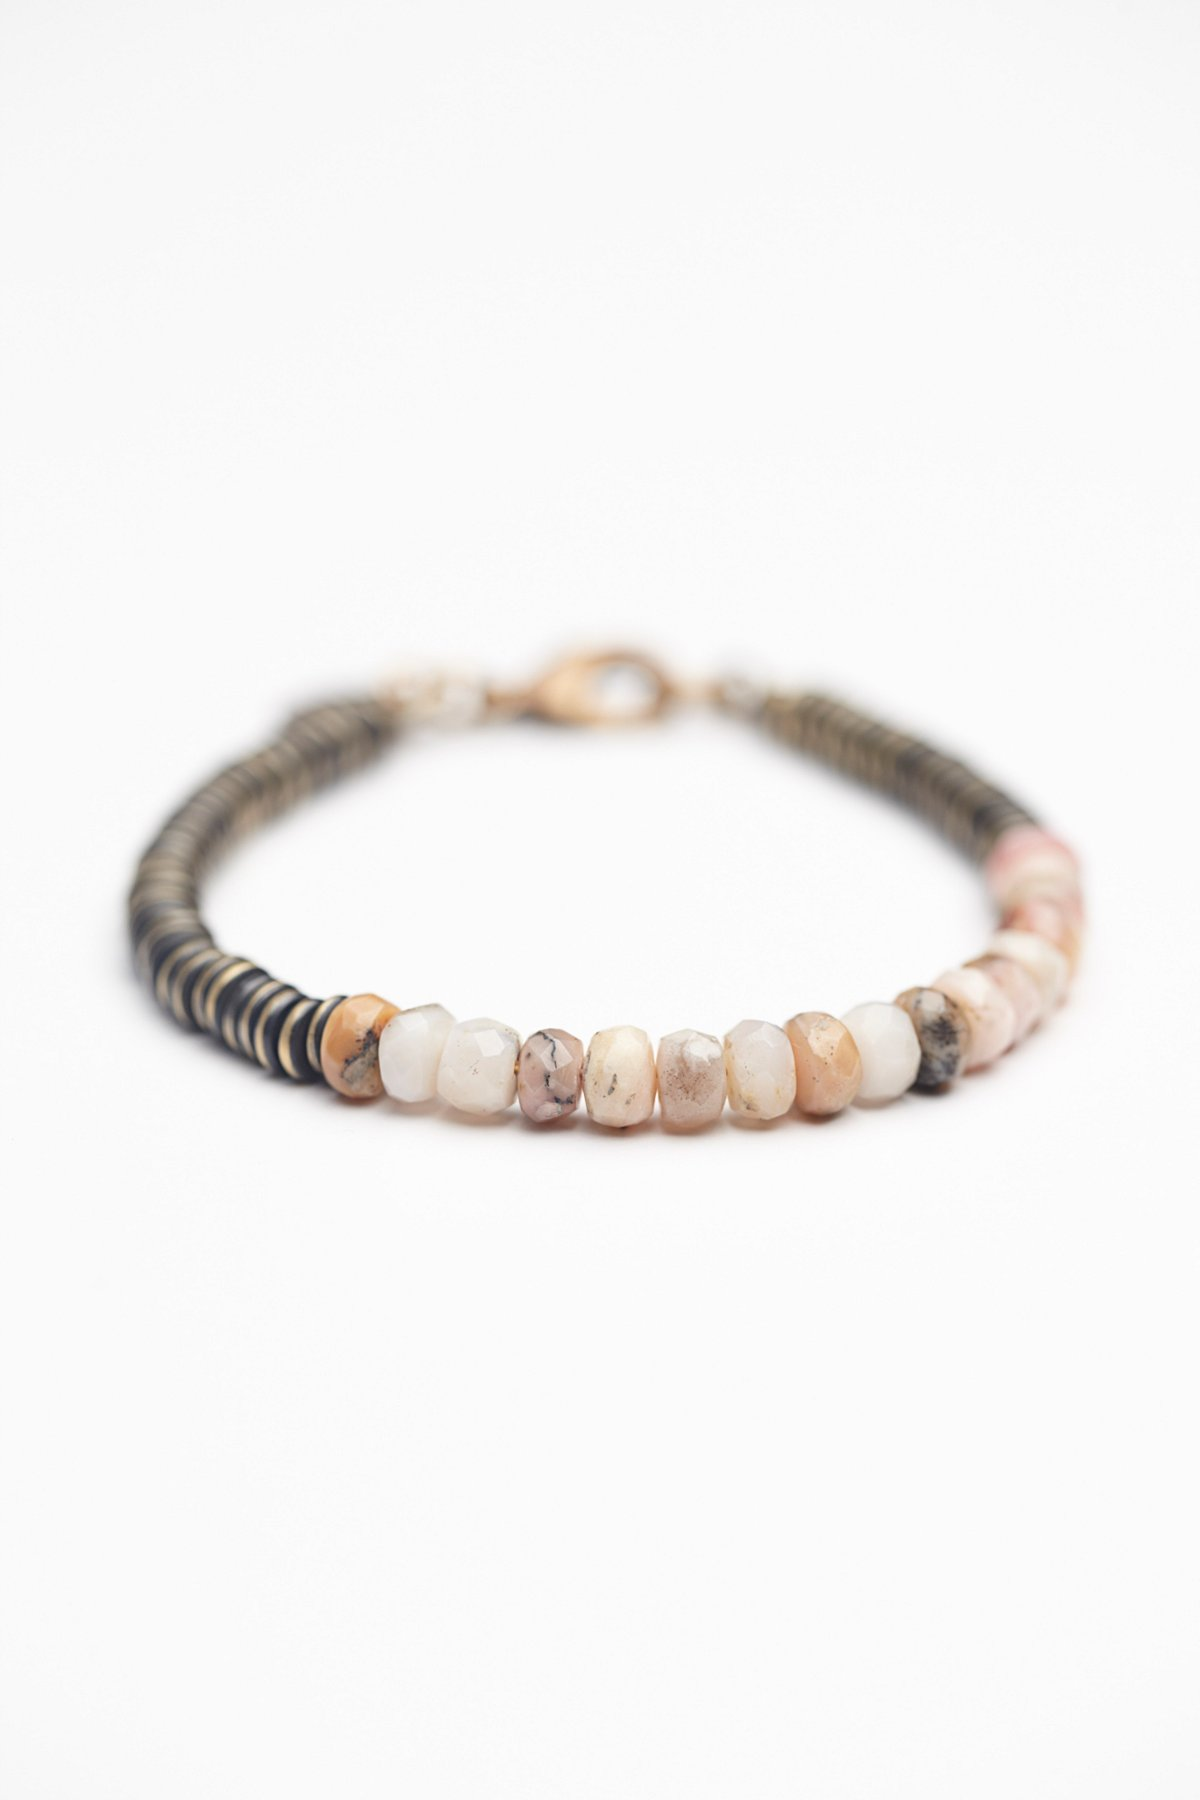 Bhanda Stone Bracelet